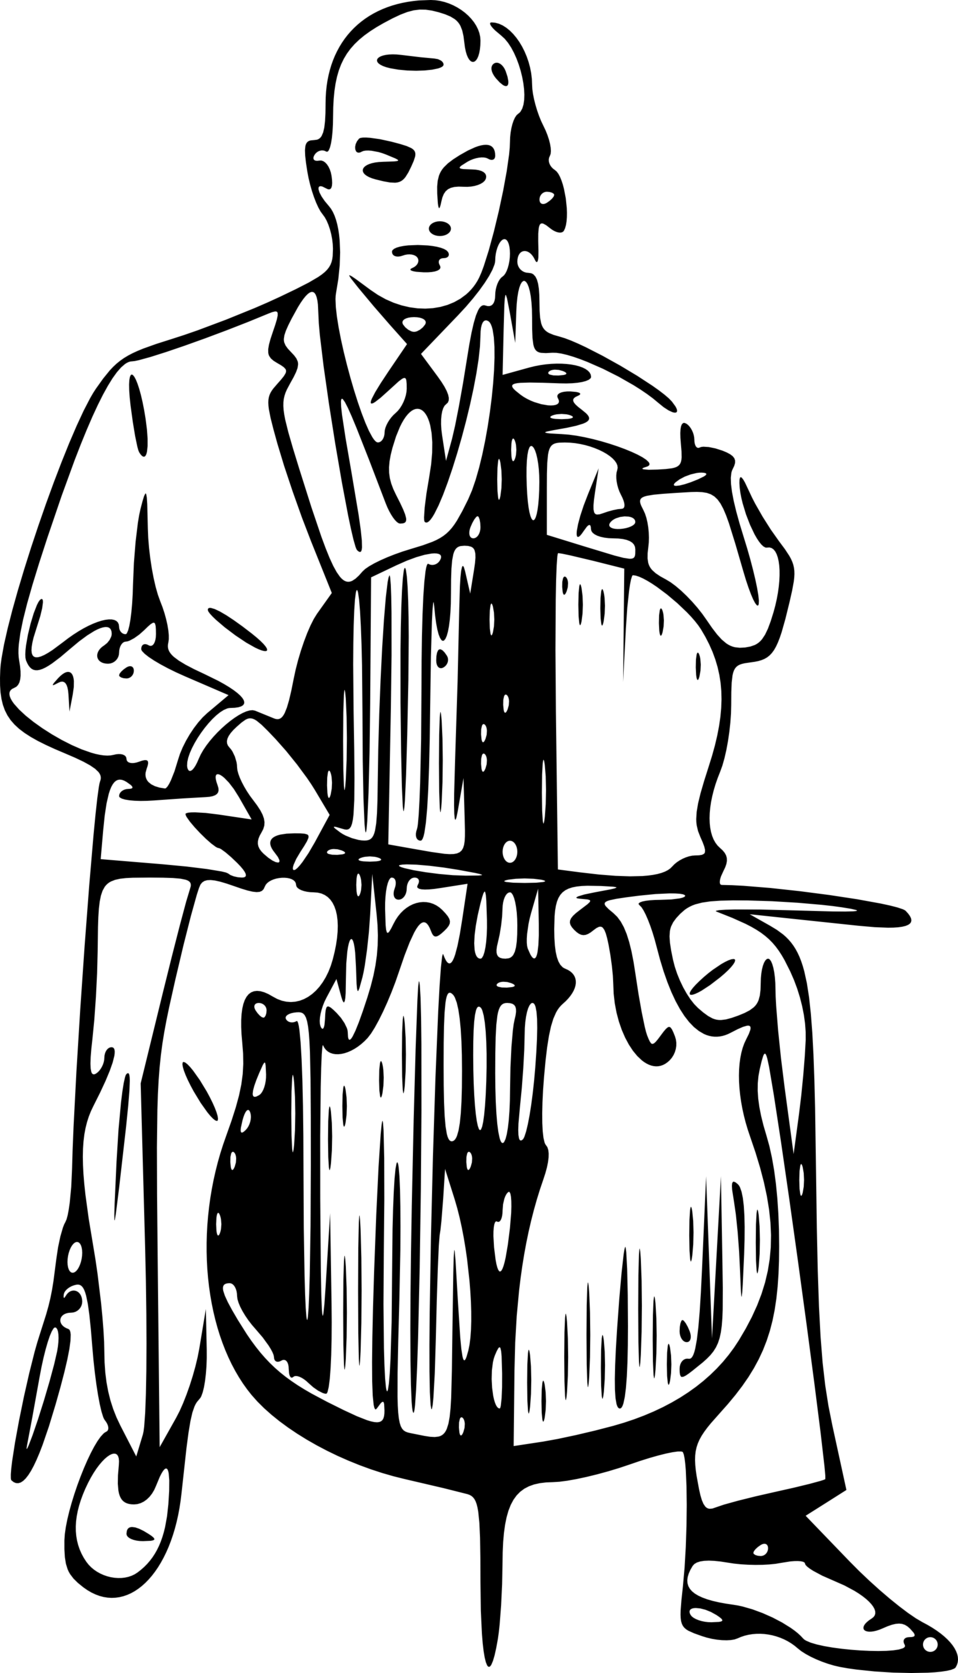 Cello clipart clip art. Public domain image man